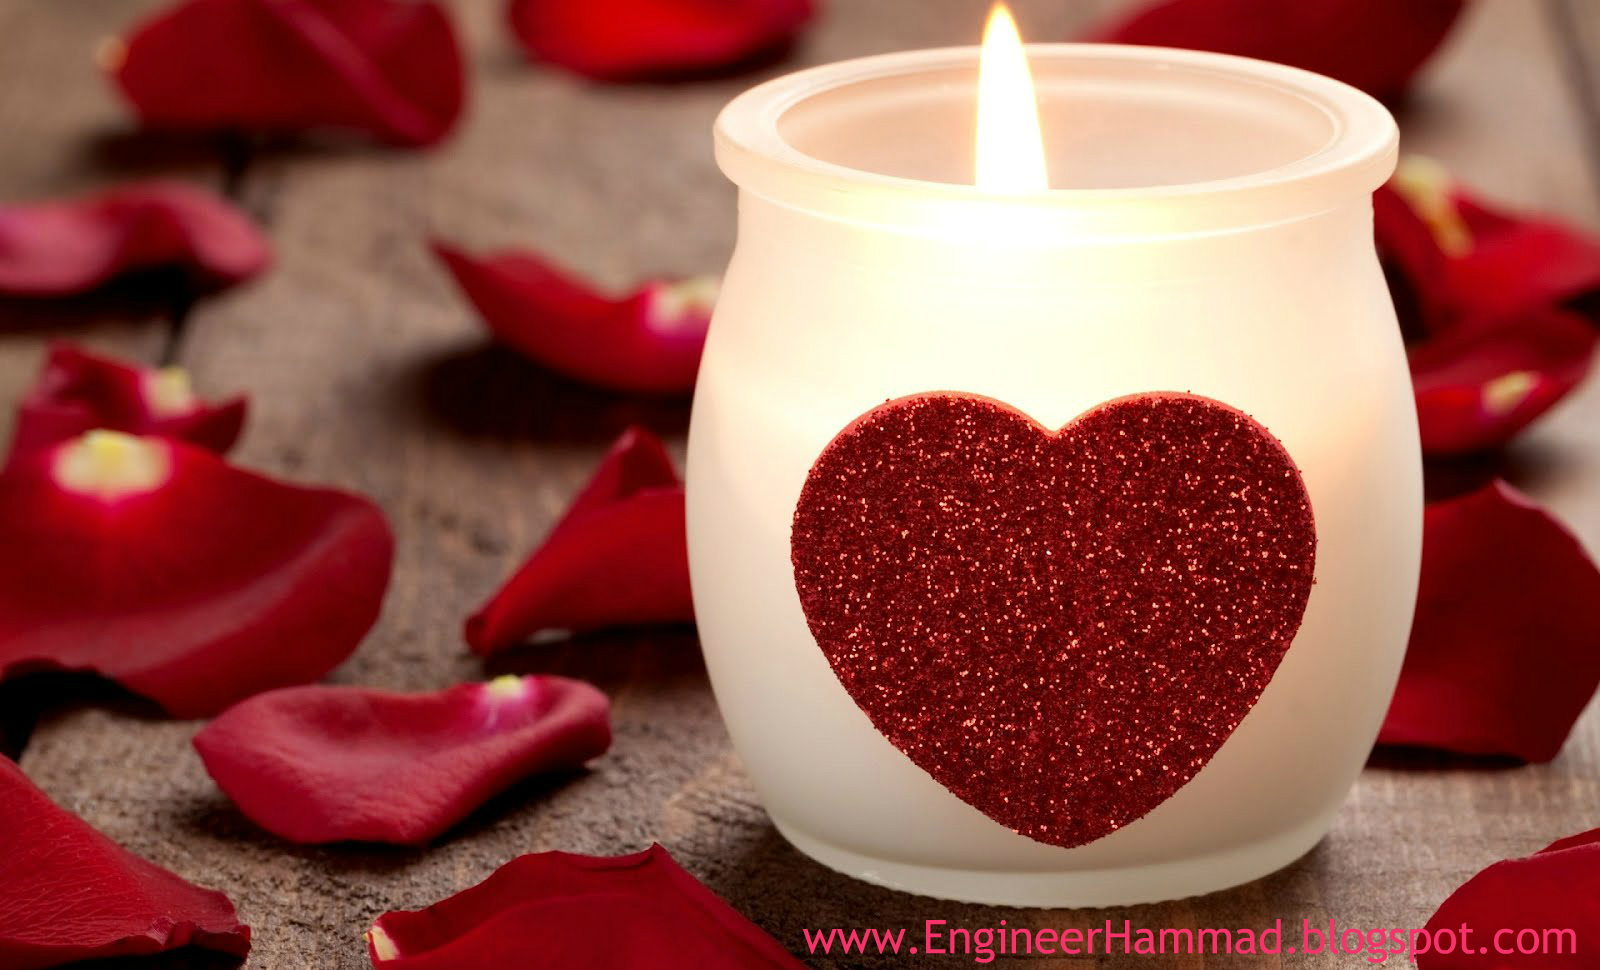 Wallpaper download new love - Love Wallpaper 3